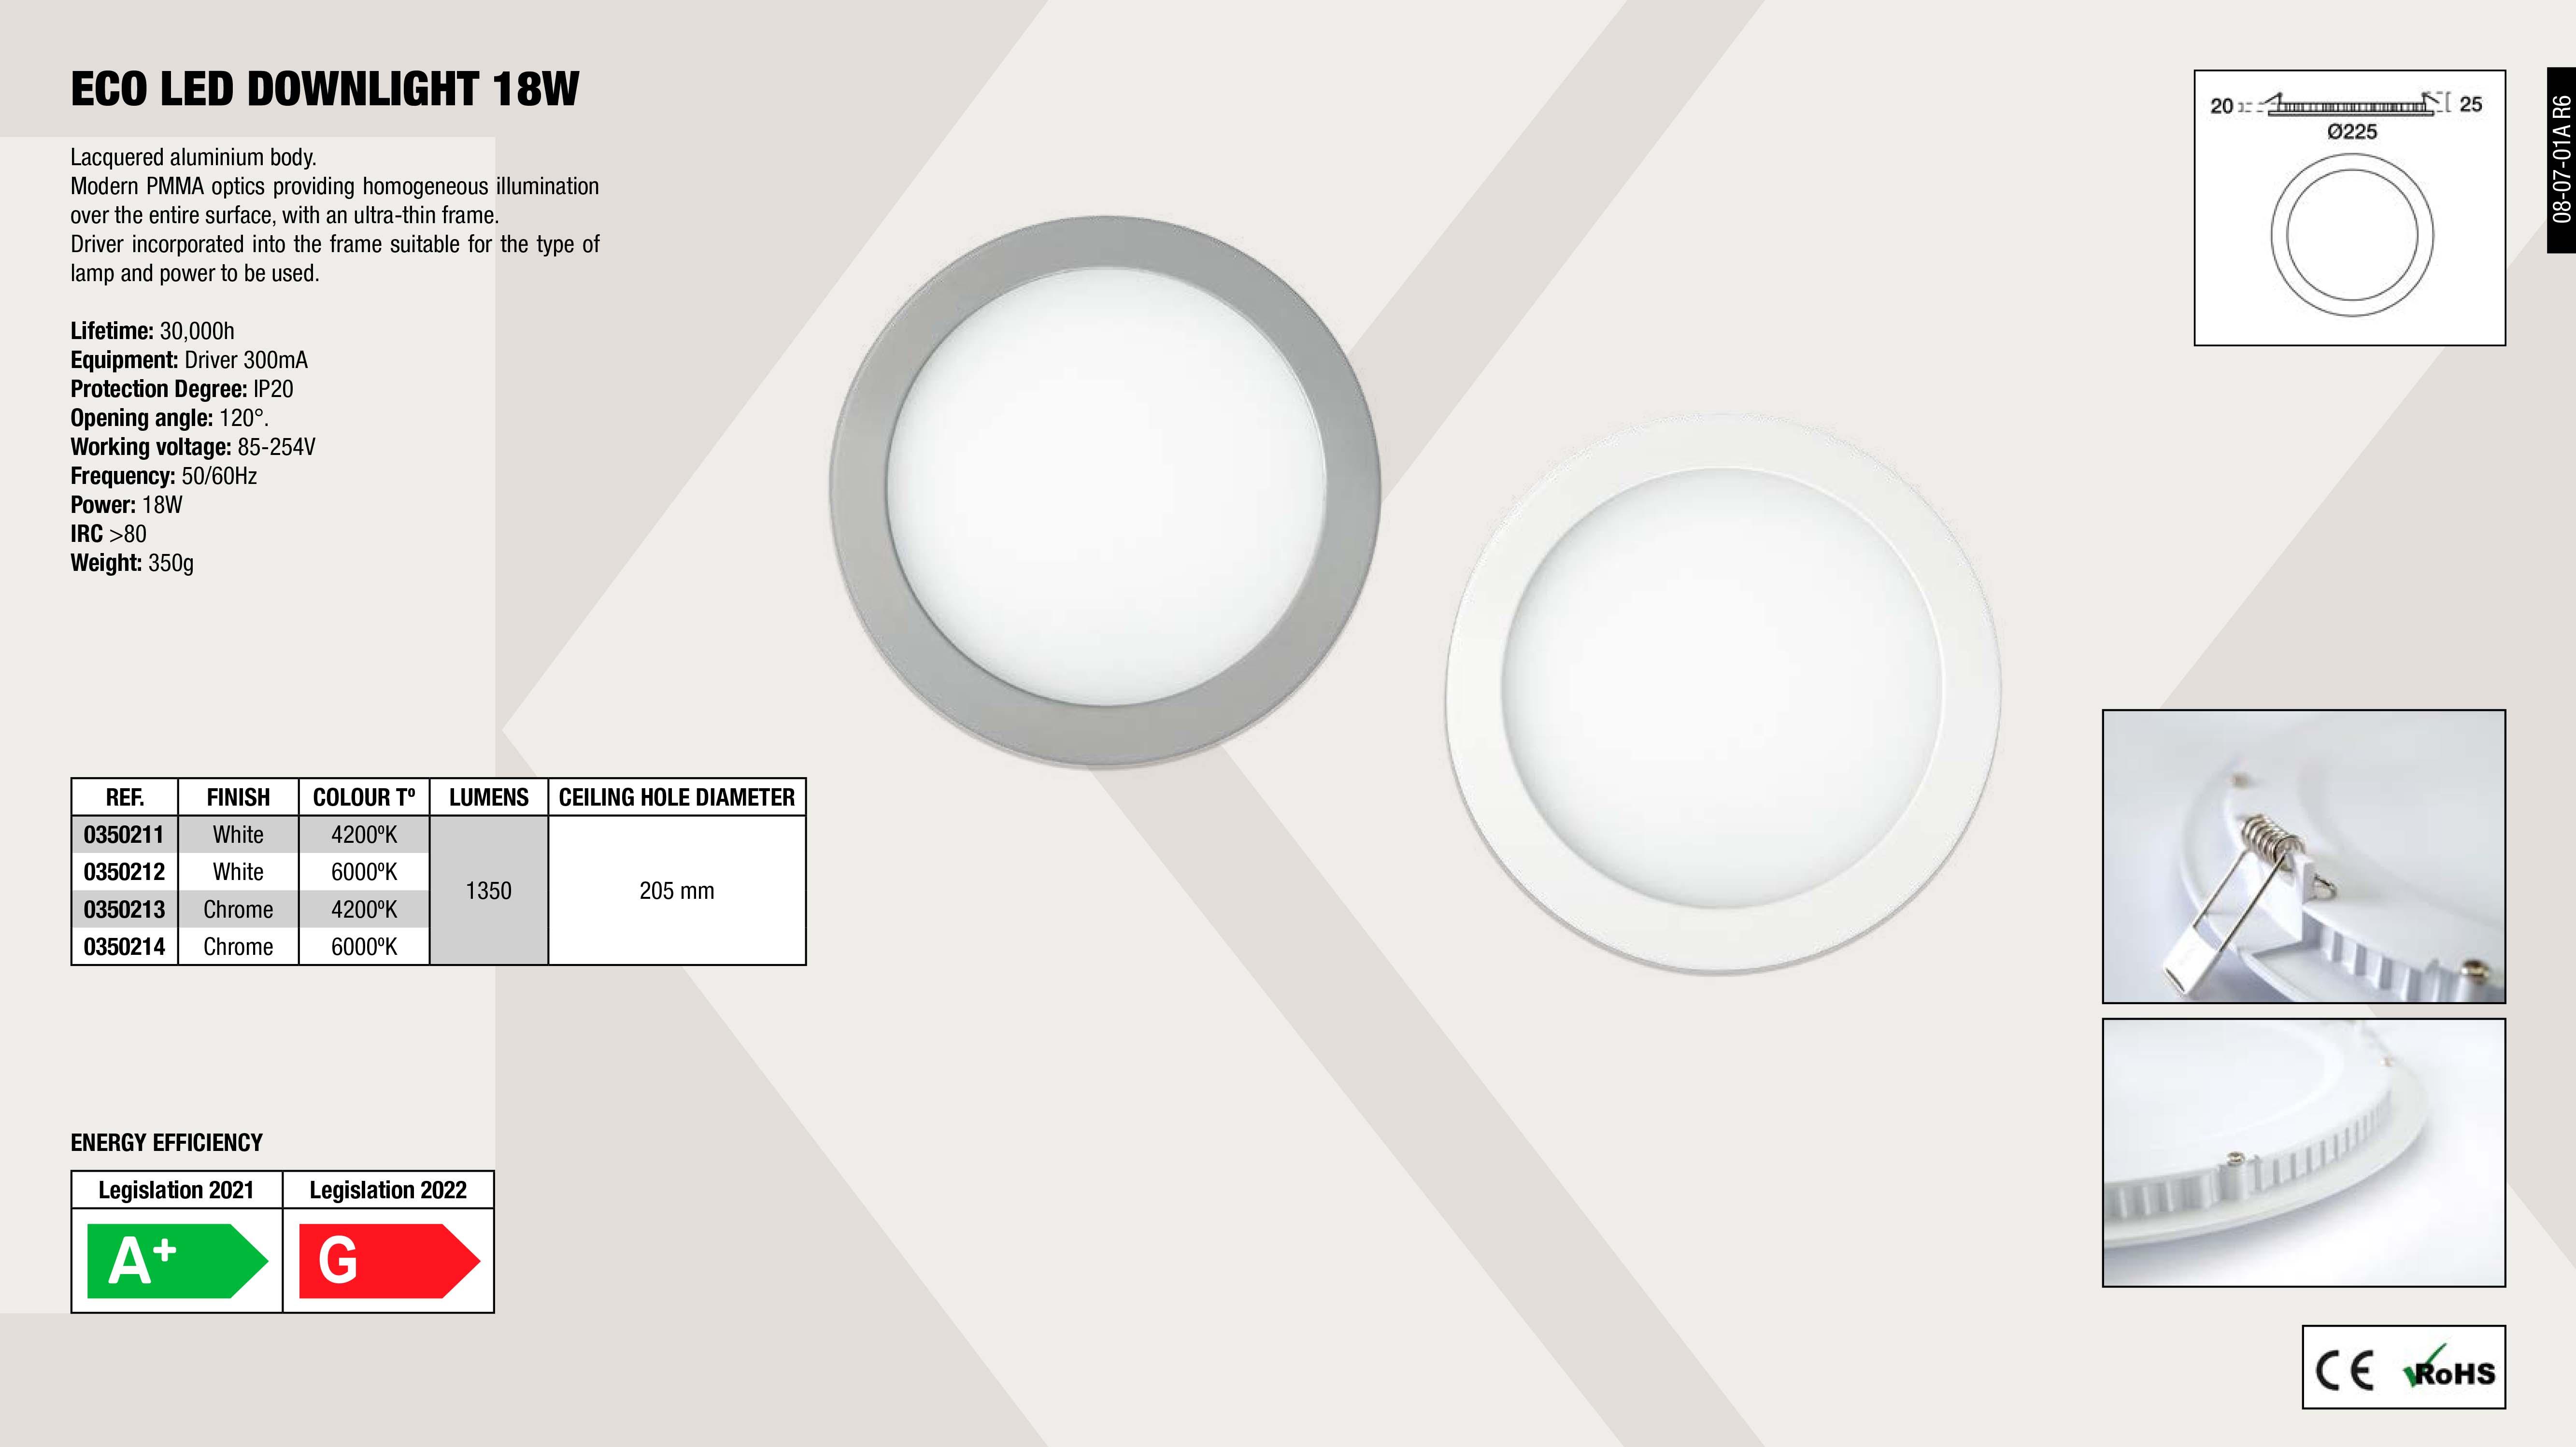 DOWNLIGHT MICRO LED INOX 7,7                                ,  DOWNLIGHT ECO LED INOX 18W 50                               ,  DOWNLIGHT ECO LED WHITE 18W 5                               ,  DOWNLIGHT ECO LED WHITE 18W 4                               ,  DOWNLIGHT ECO LED INOX 18W 40                               ,  DOWNLIGHT MICRO LED WHITE 7,7                               ,